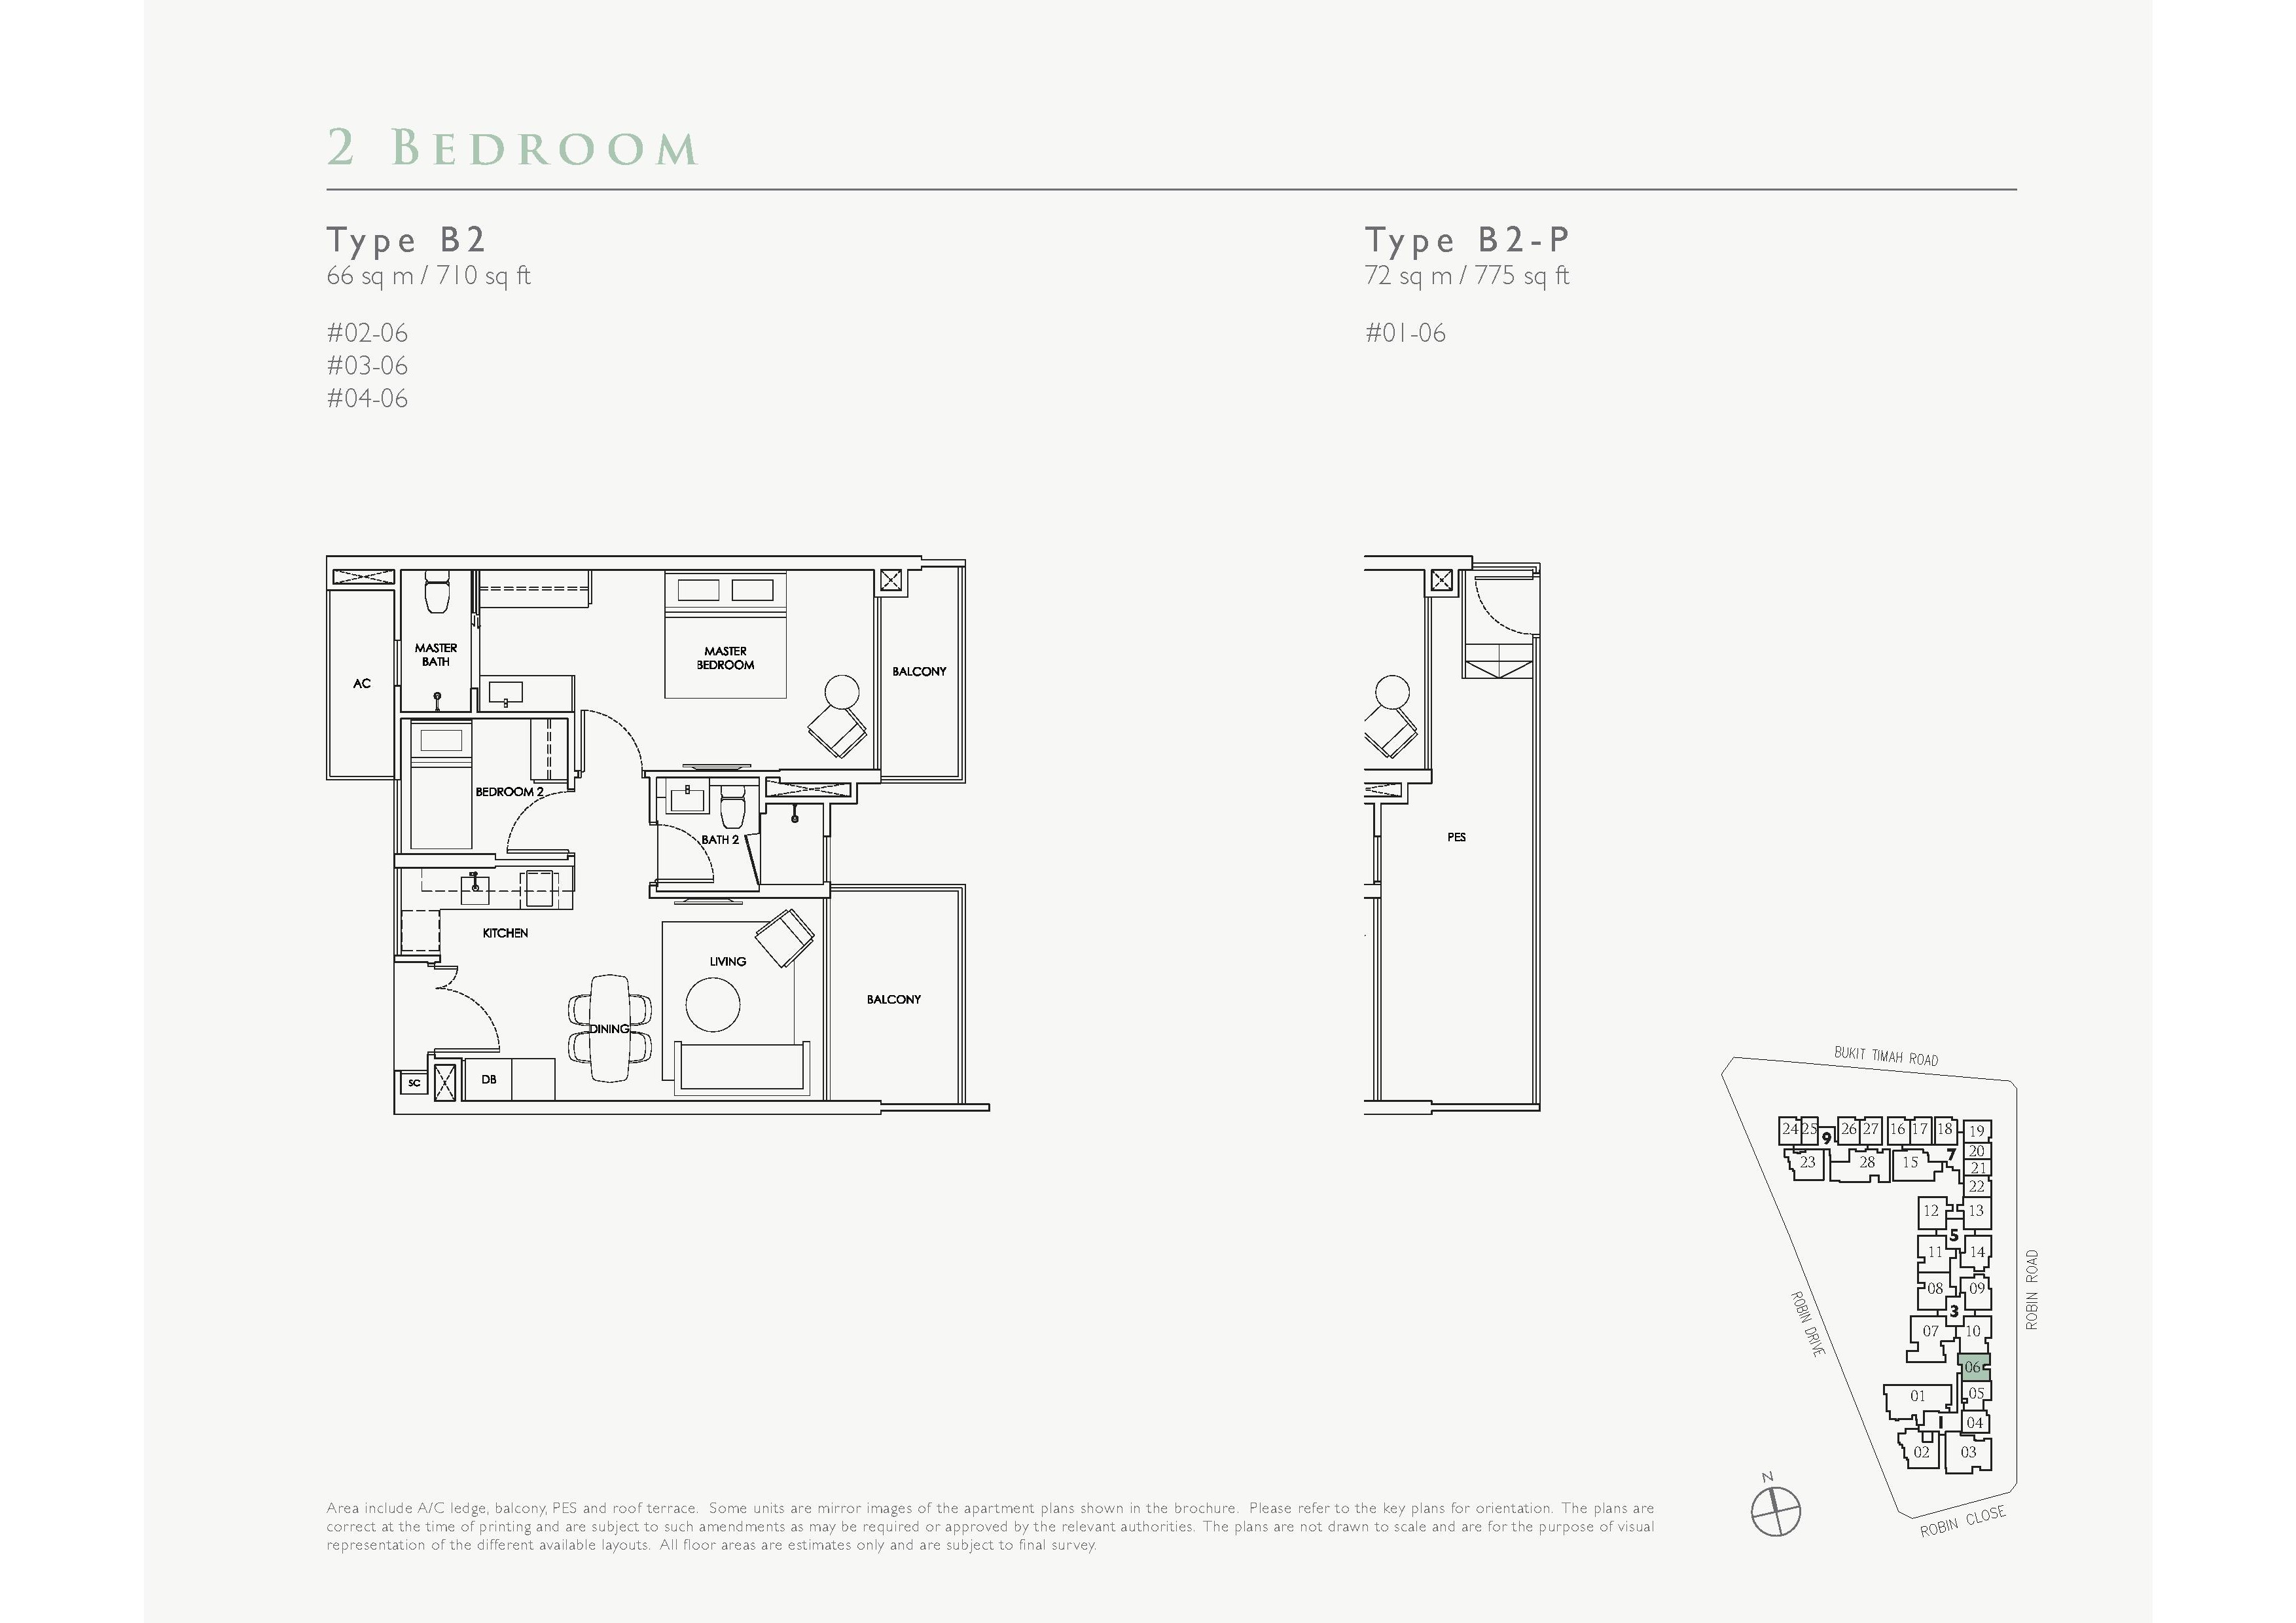 Robin Residences 2 Bedroom Floor Plans Type B2, B2-P